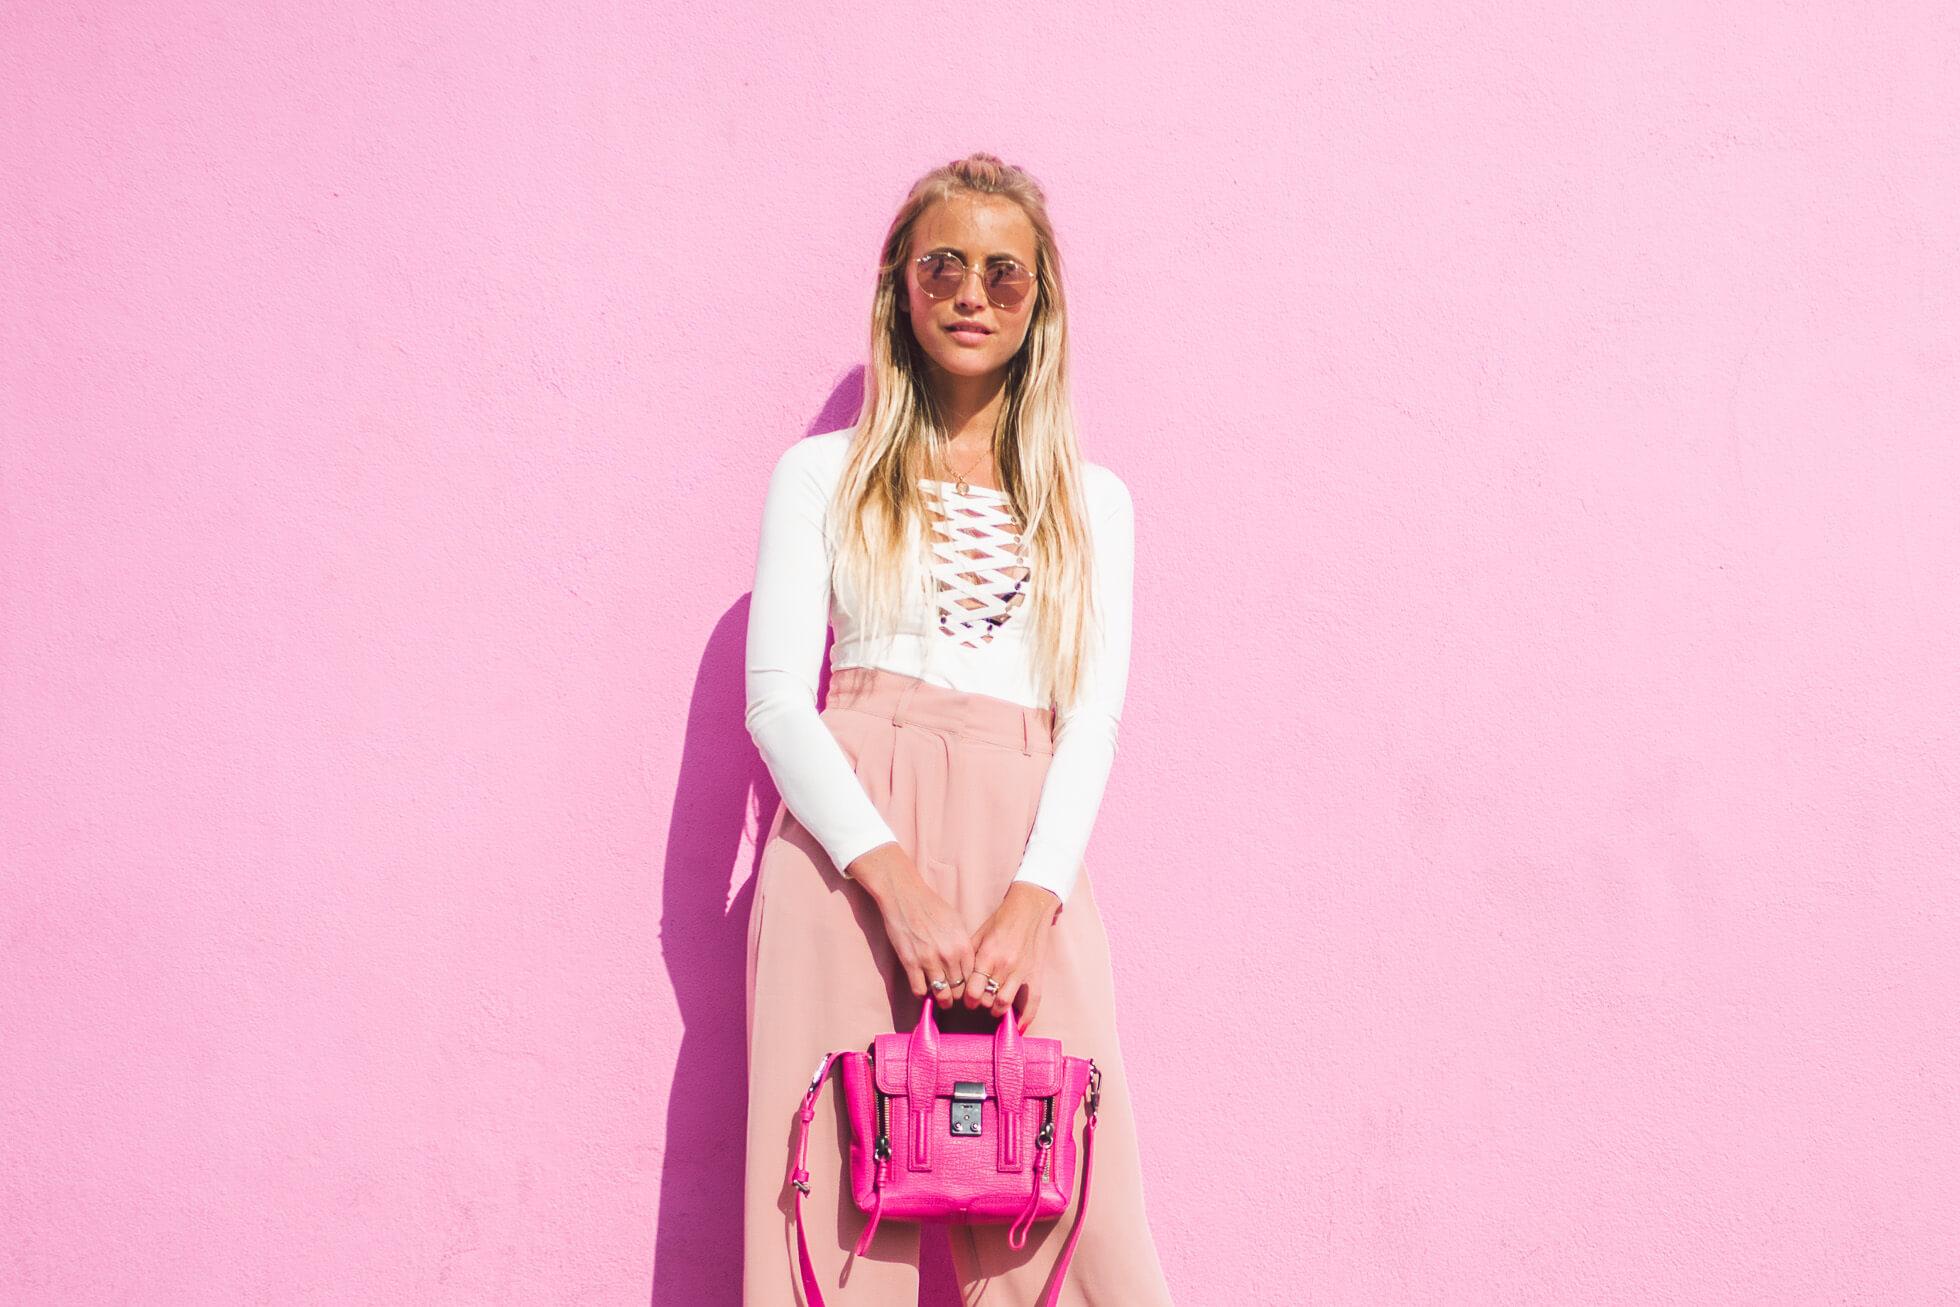 janni-deler-pink-wallL1020859